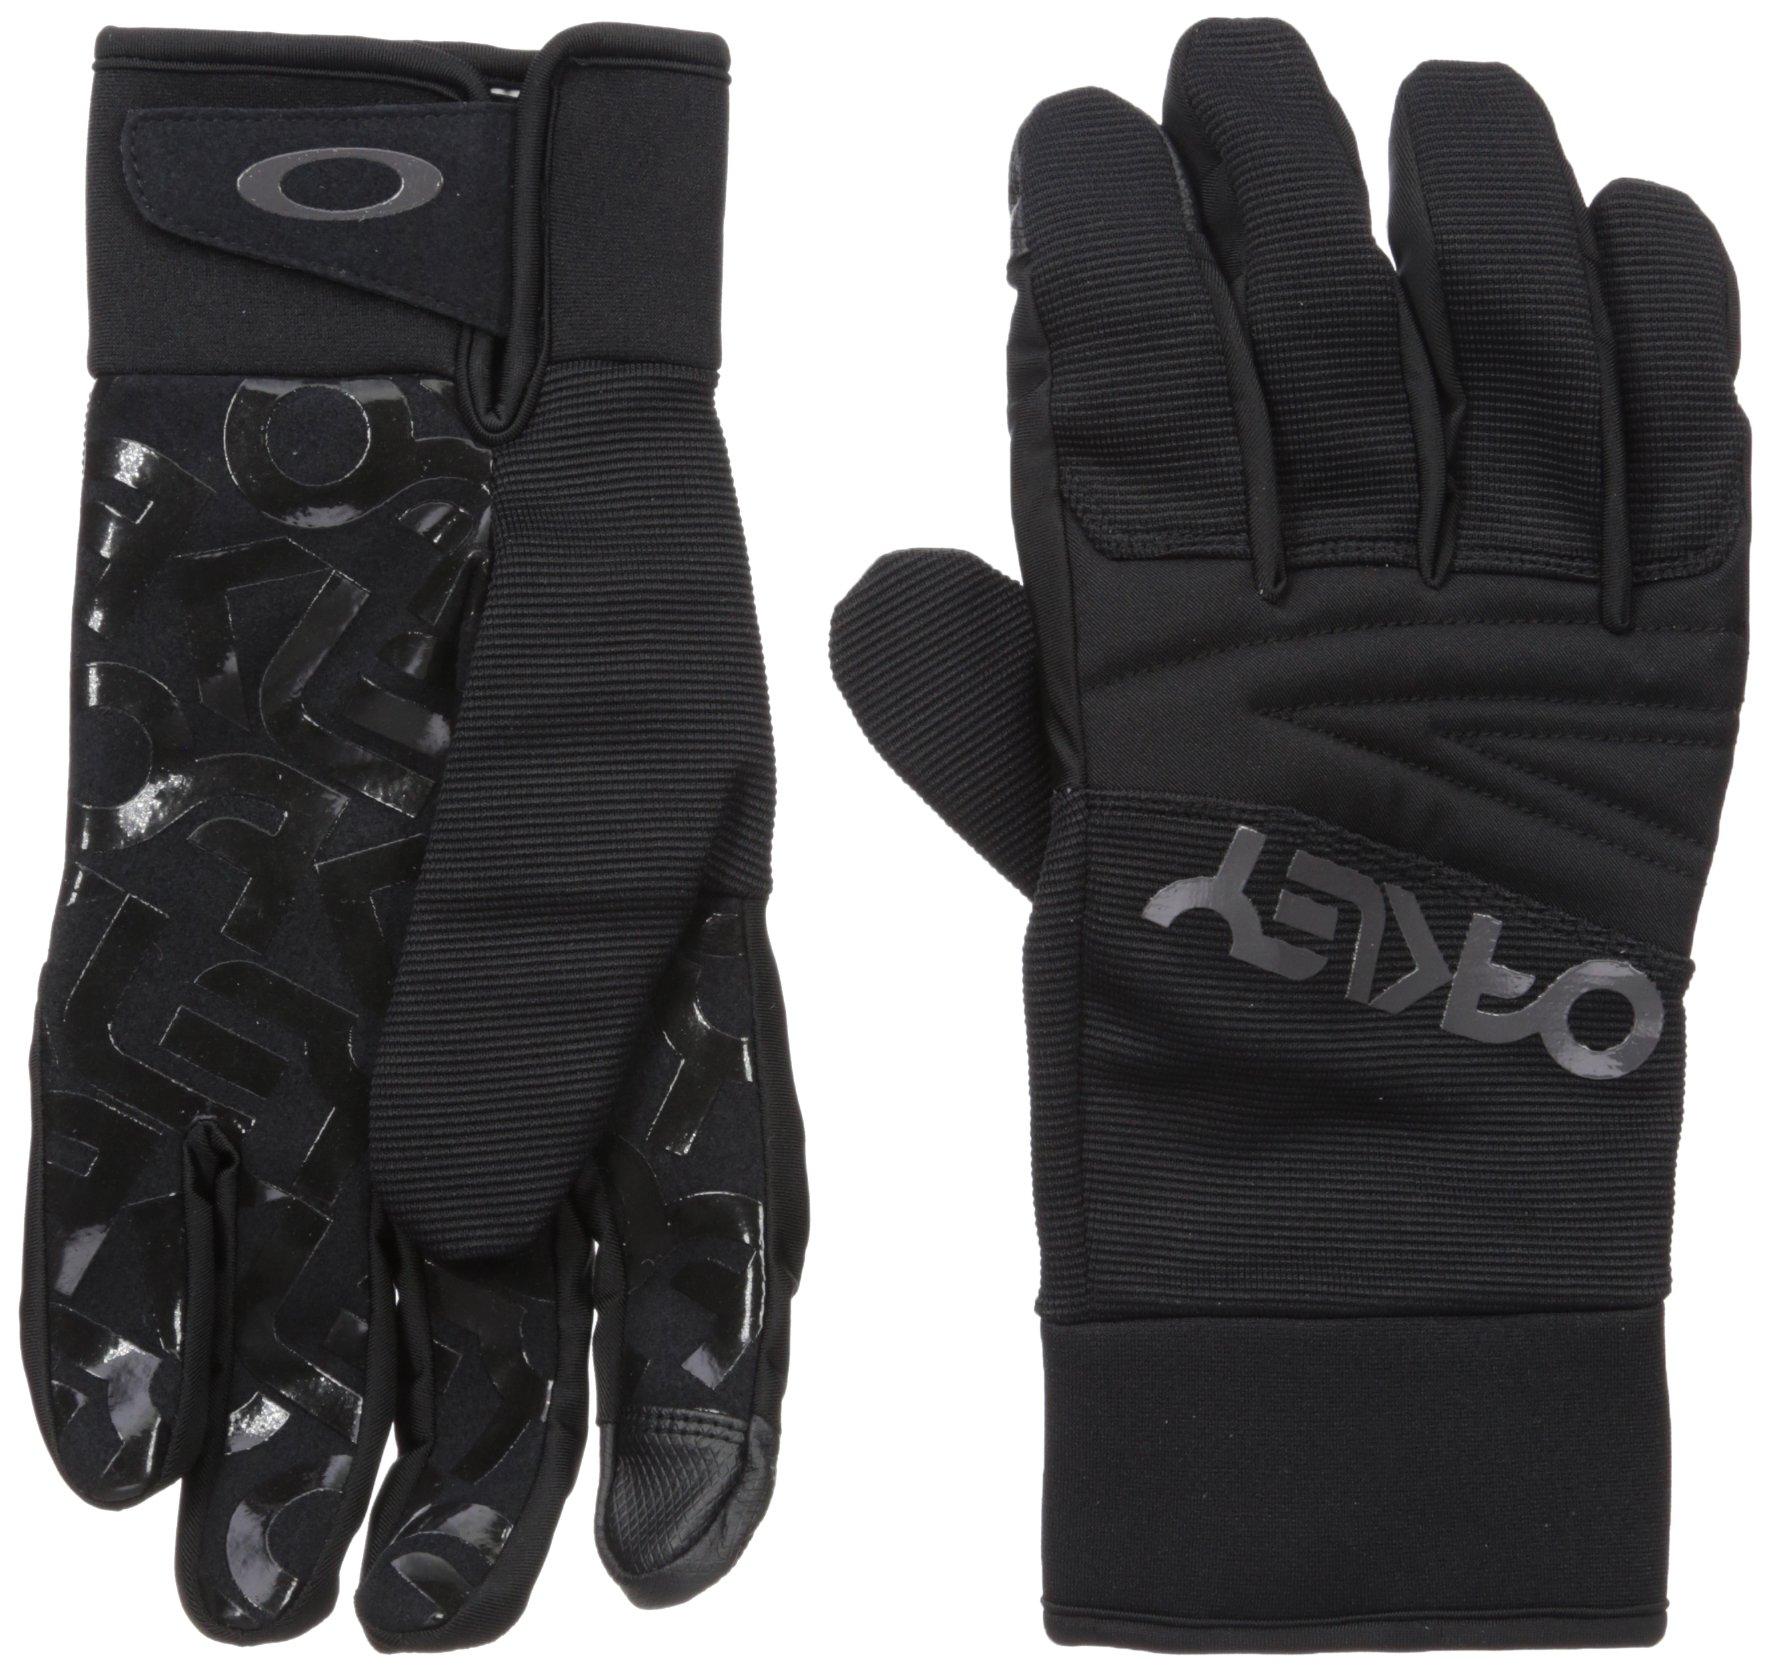 Oakley Factory Park Gloves, Blackout, Small